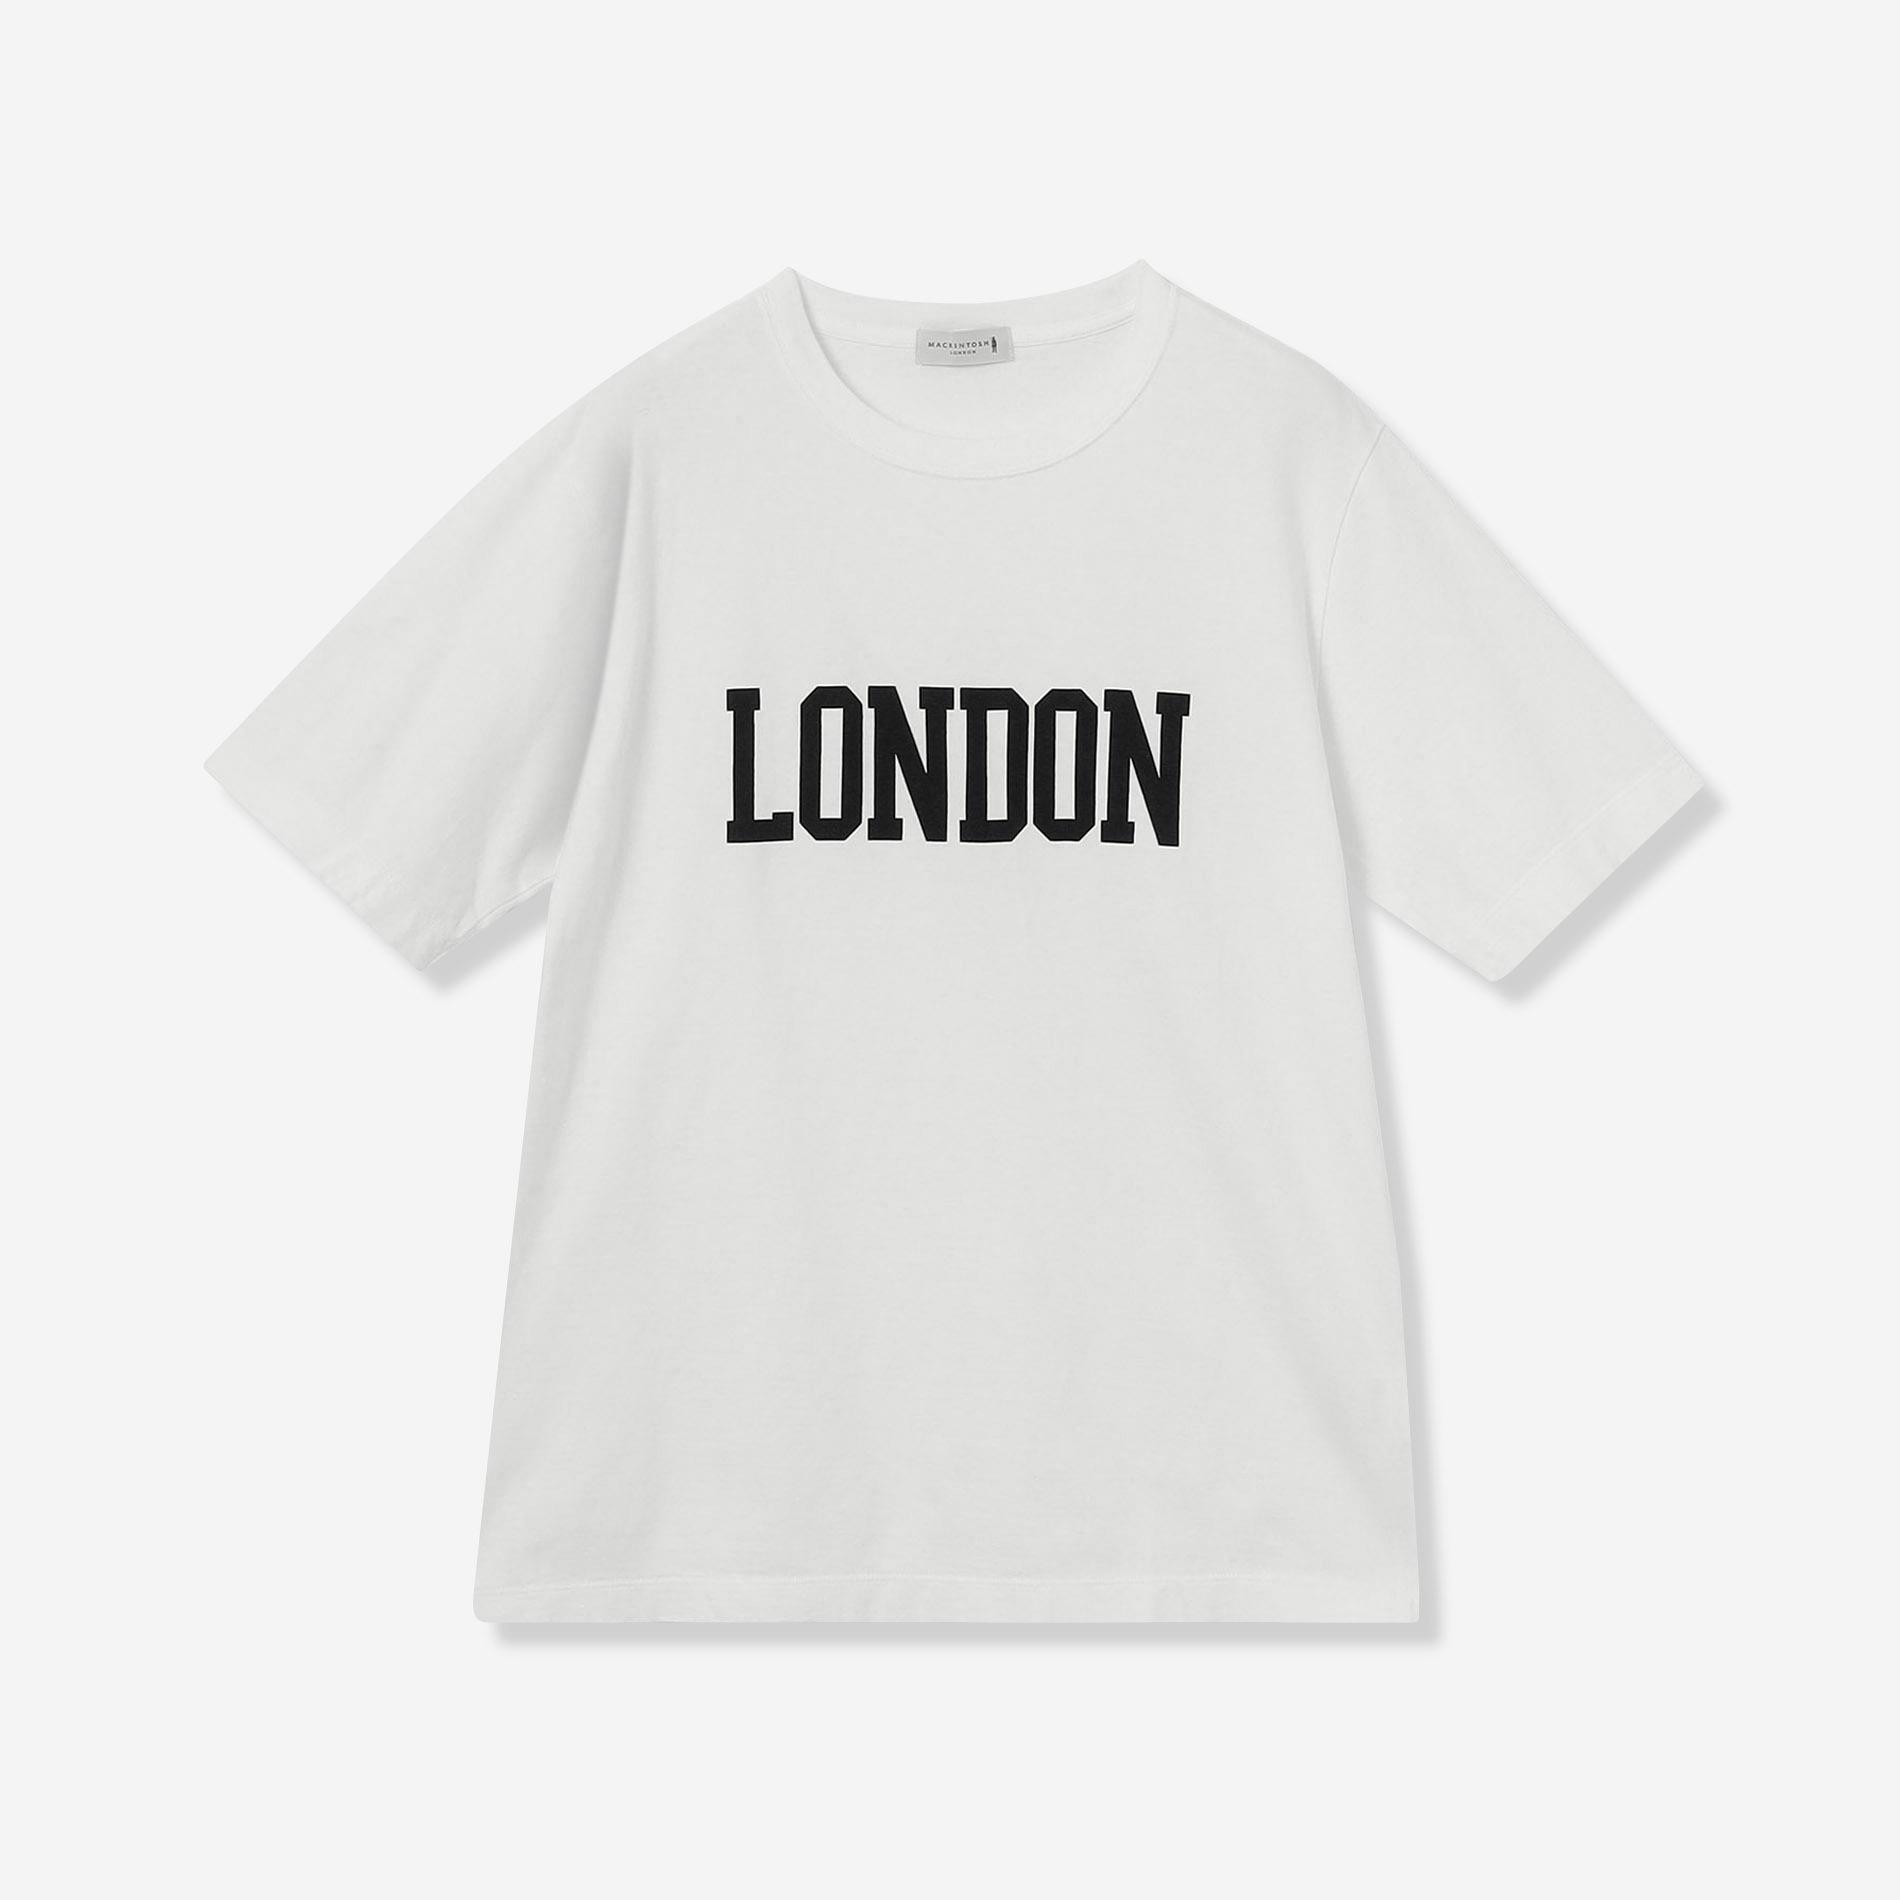 LONDONプリントTシャツ